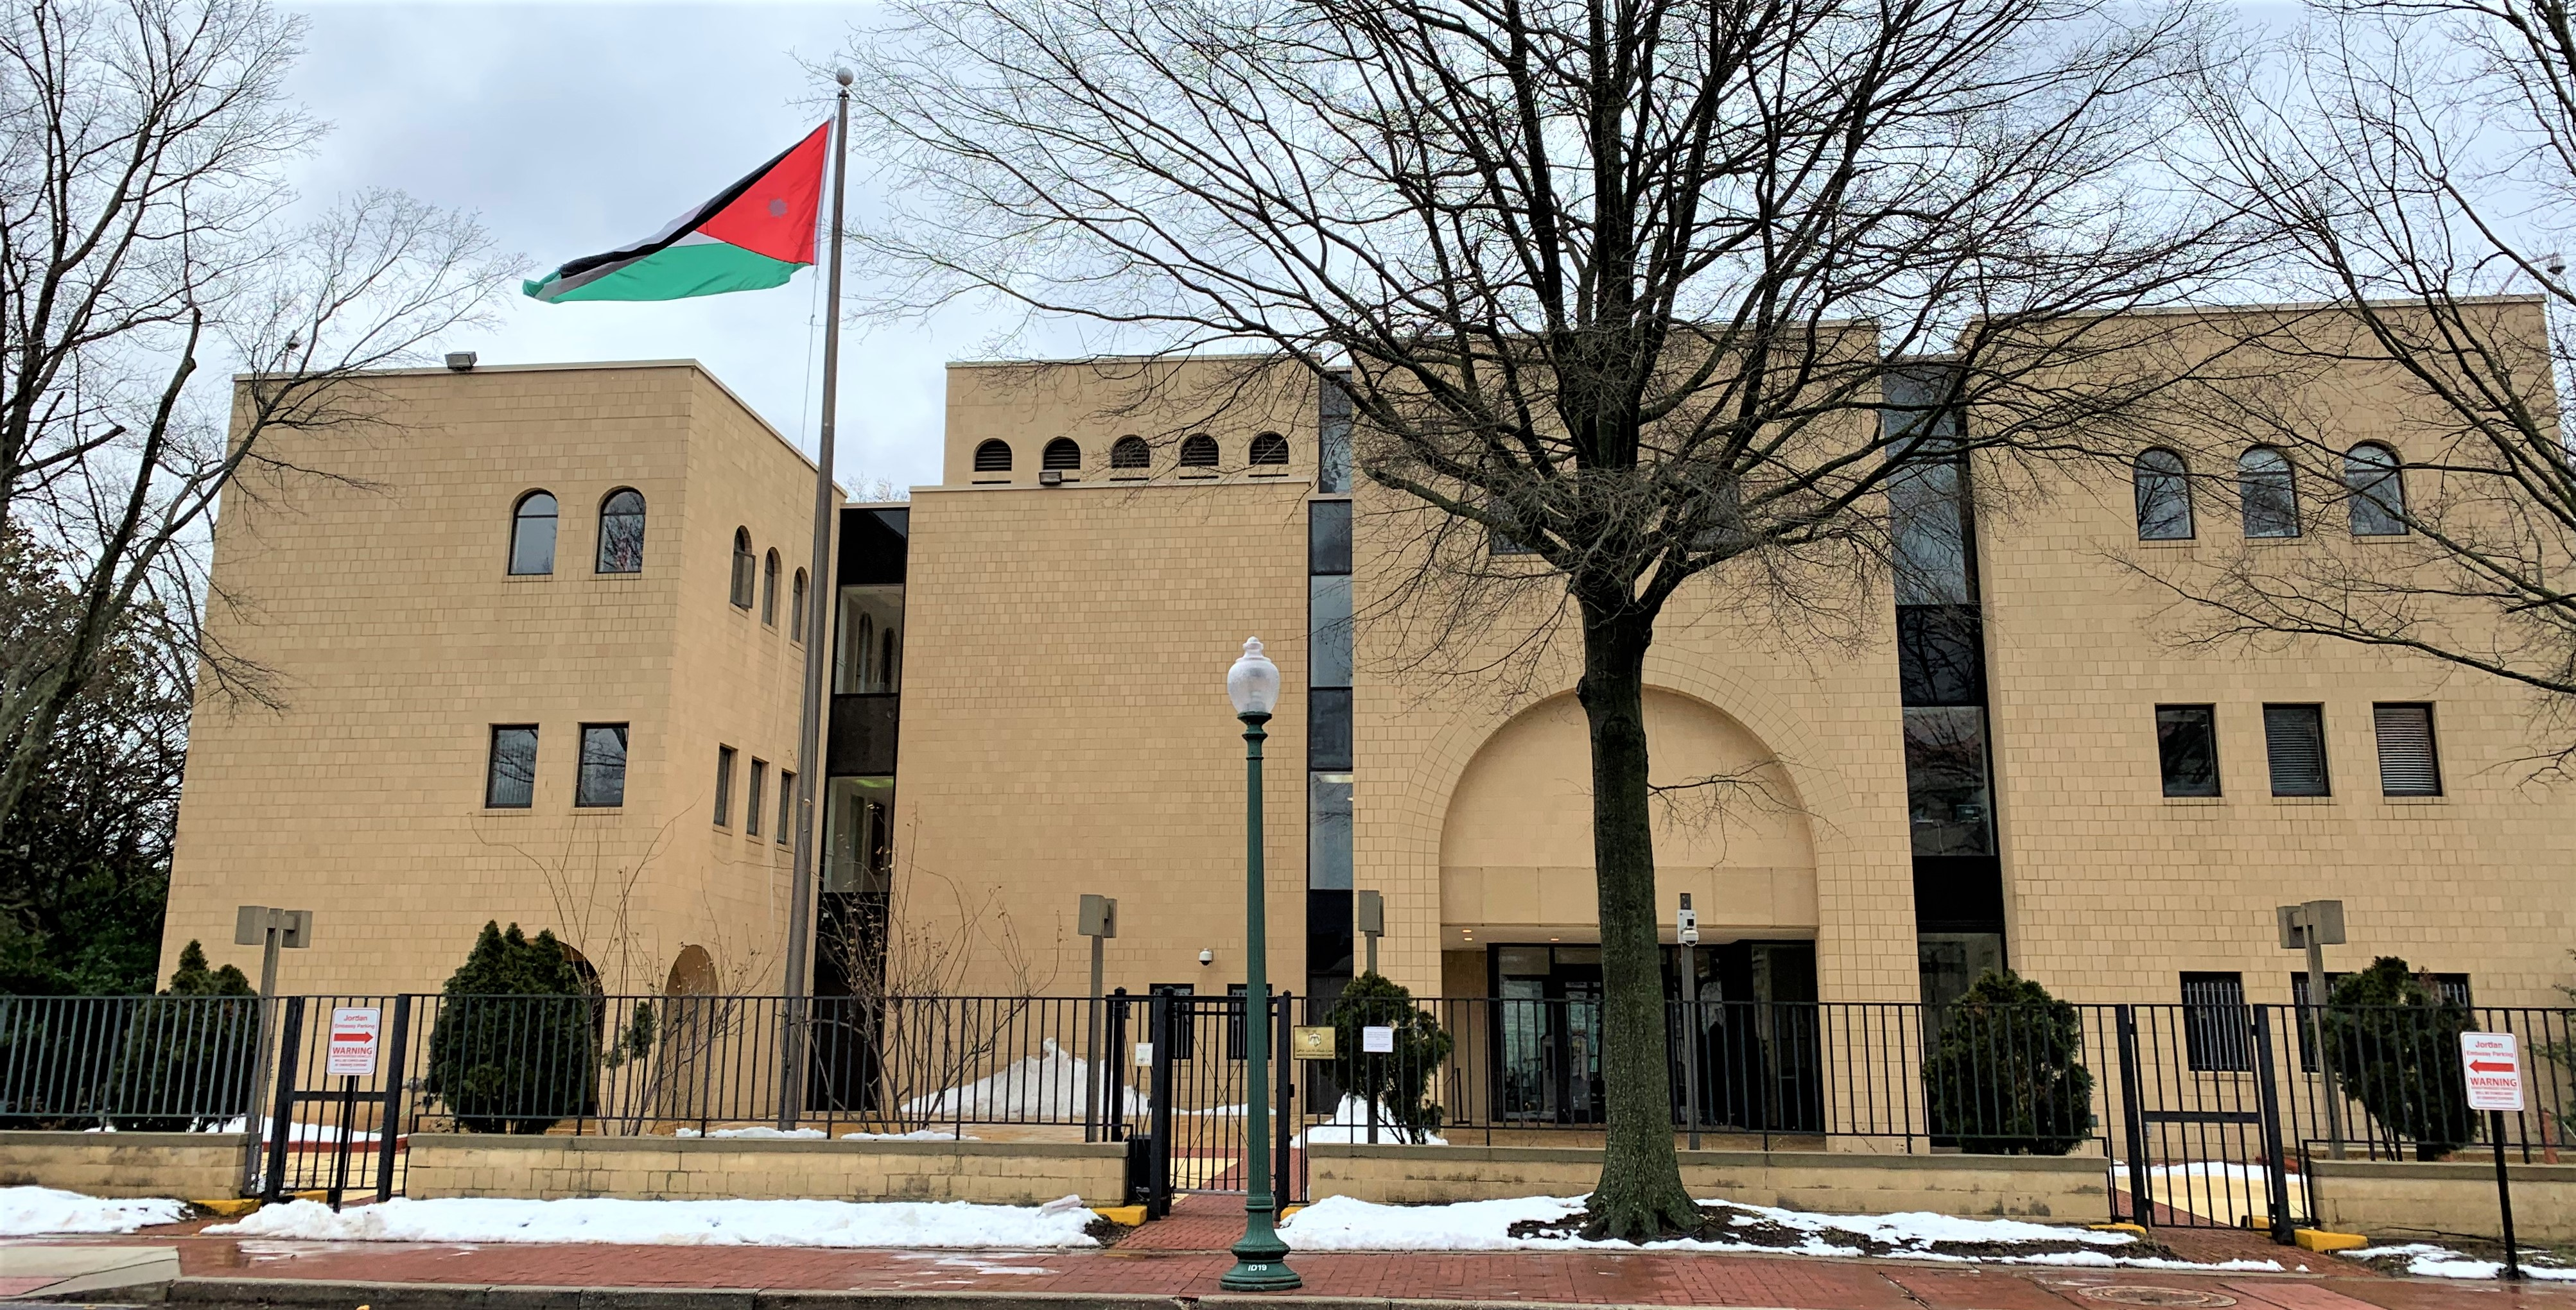 Real Estate and Homes For Sale Near the Embassy of Jordan in Washington, DC. Artyom Shmatko Realtor